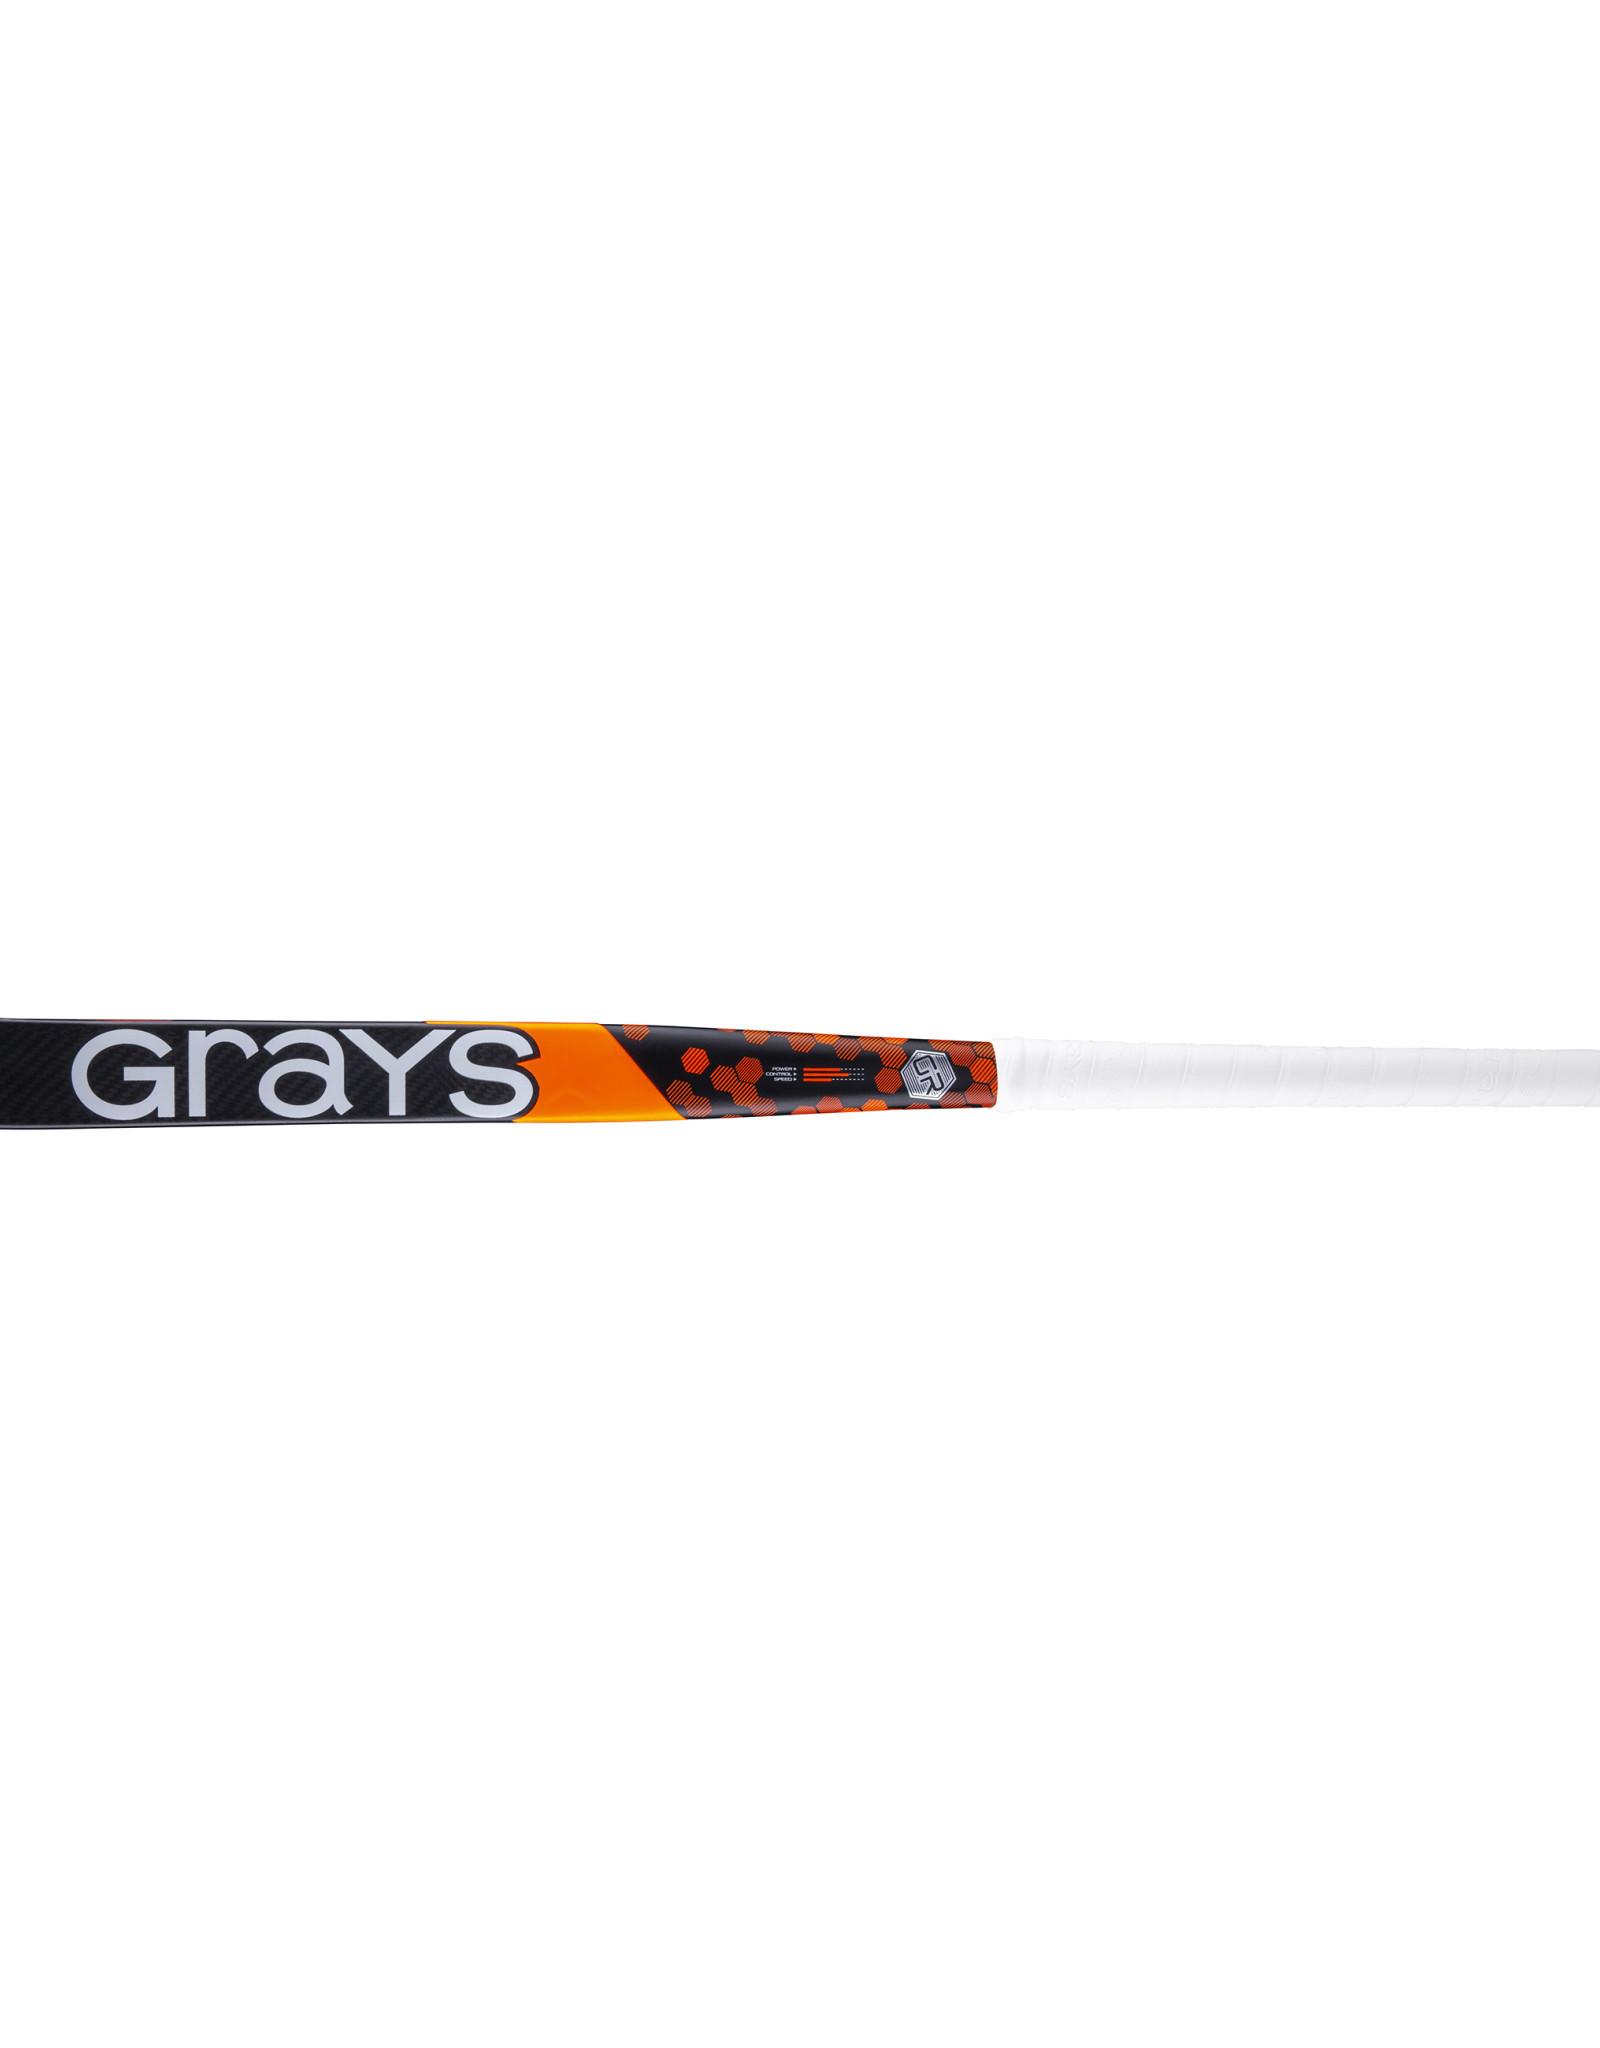 Grays STK GR5000 MB MC